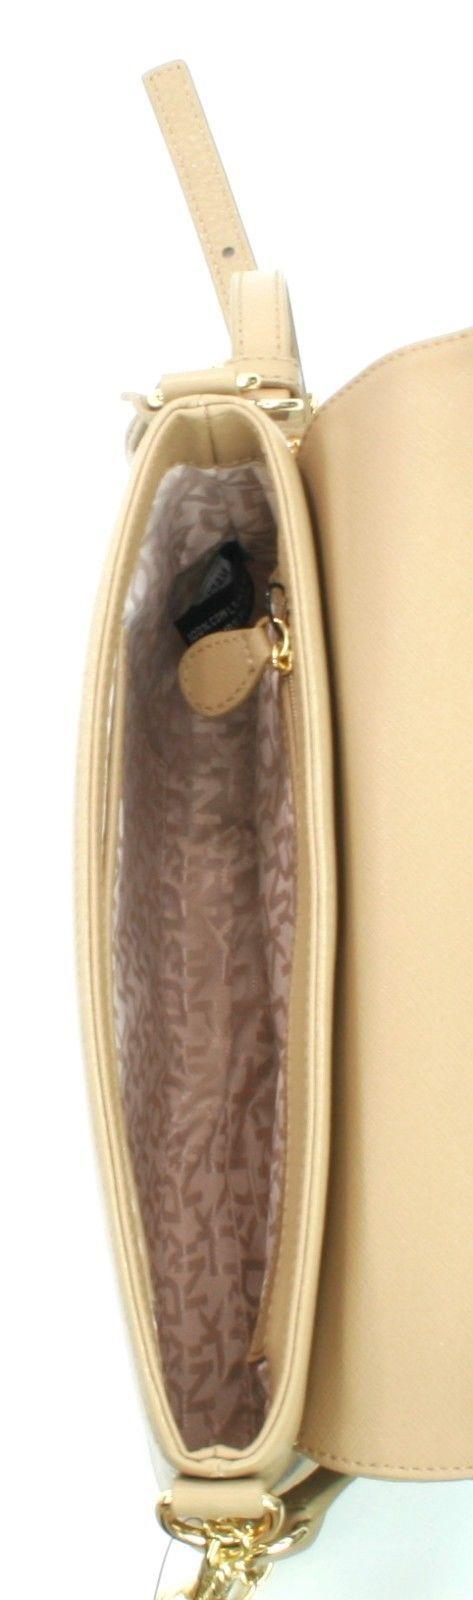 DKNY Donna Karan Tan Beige Pebbled Leather Shoulder Bag Small Handbag